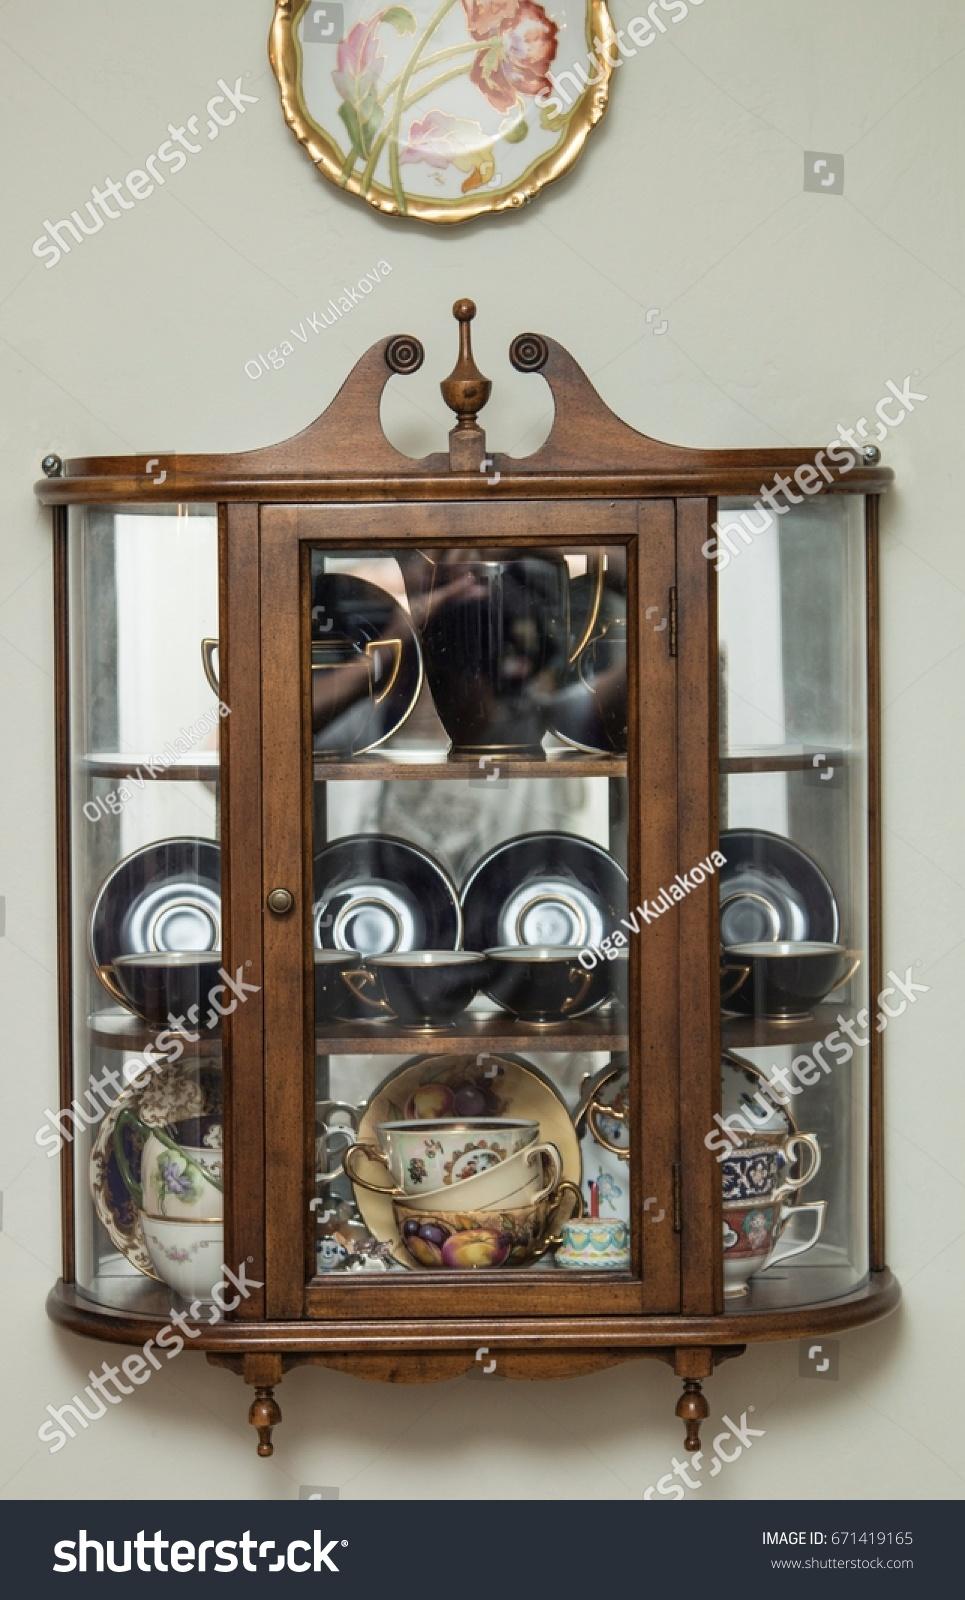 Vintage Curio Cabinet With Porcelain Tea Cup Collection